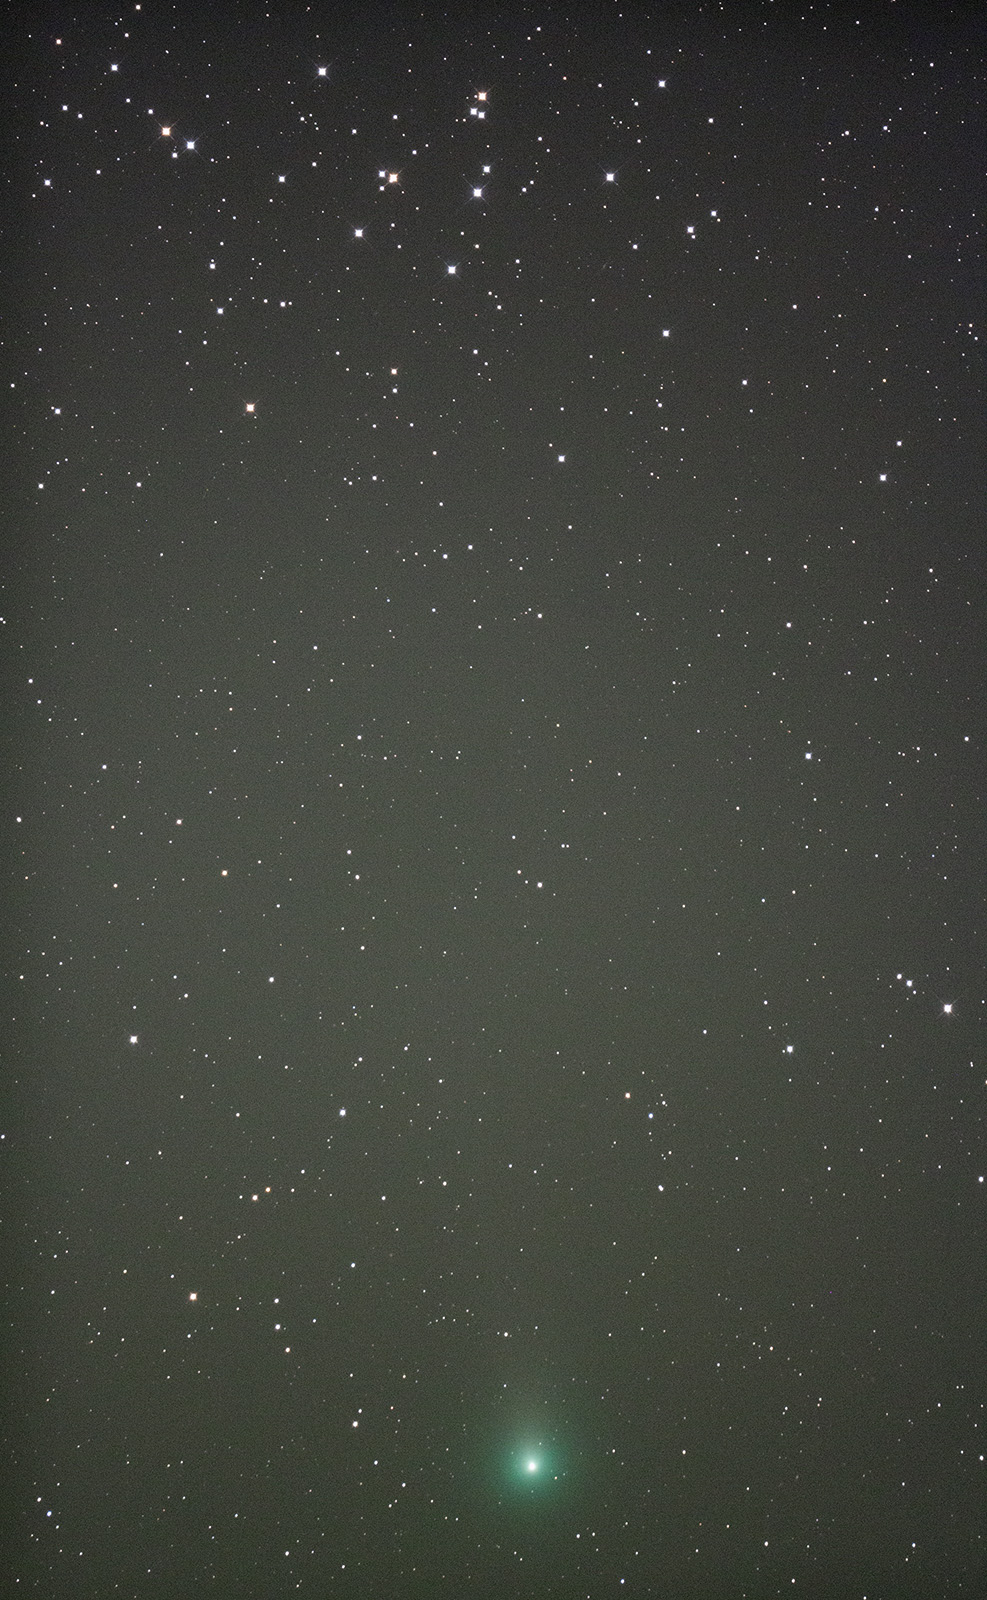 11月8日の天体写真_e0174091_13574649.jpg